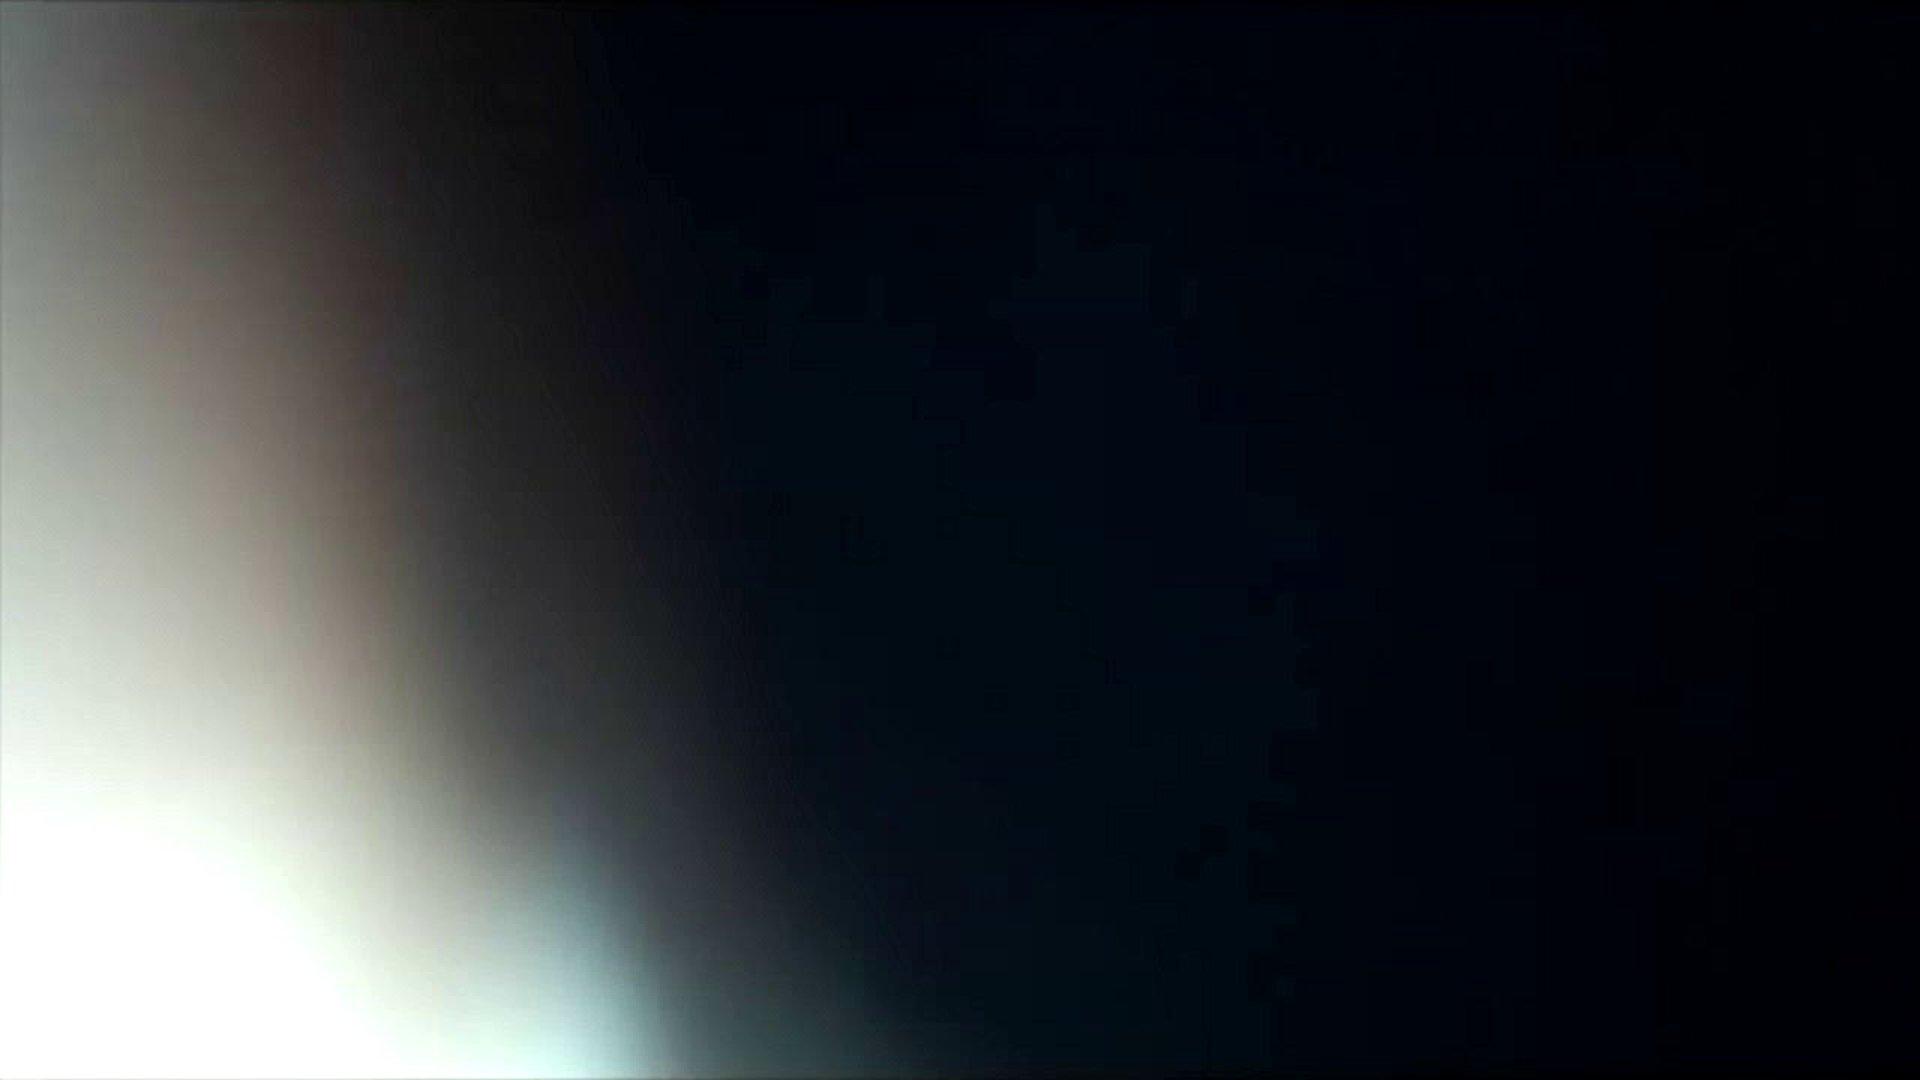 vol.14 【Yuiちゃん】ペットトリマー20歳 彼女にしたい 女子大生ハメ撮り  107Pix 14